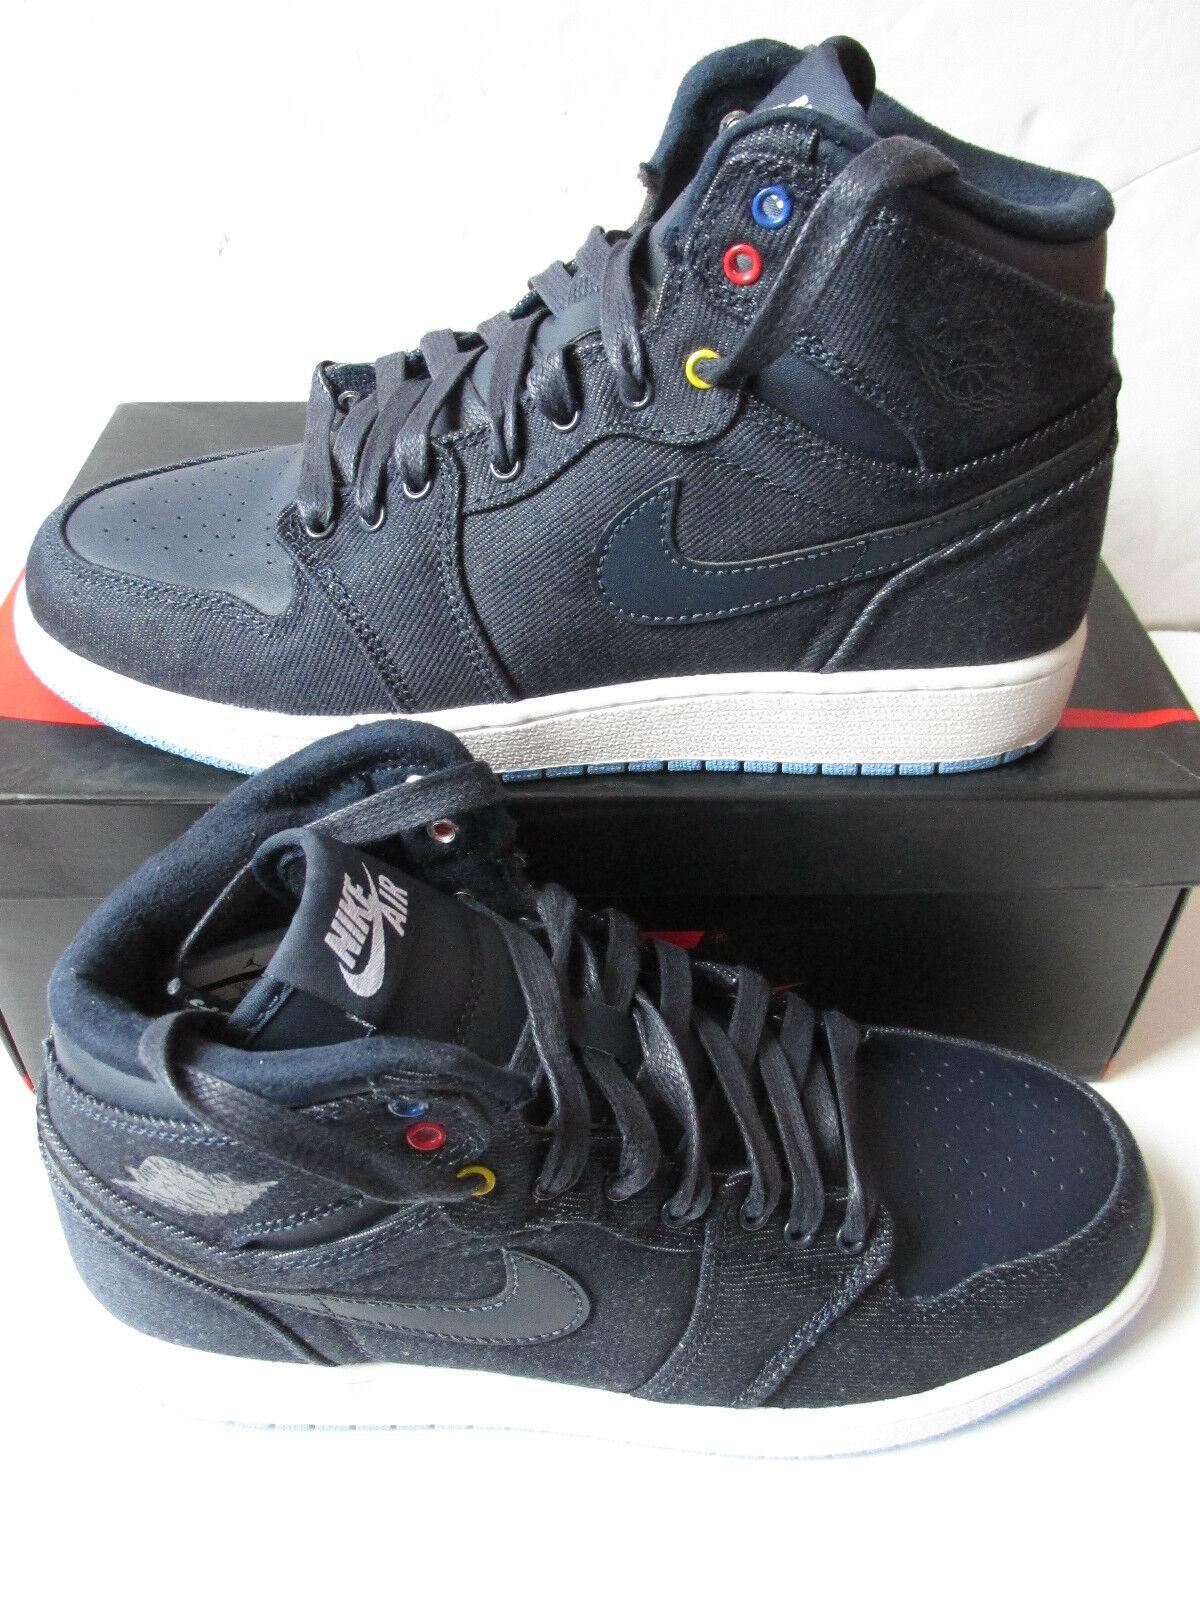 Nike air jordan 1 retro - hohe bg hi top schuhe - trainer 682782 415 Turnschuhe, schuhe top fbf6a4